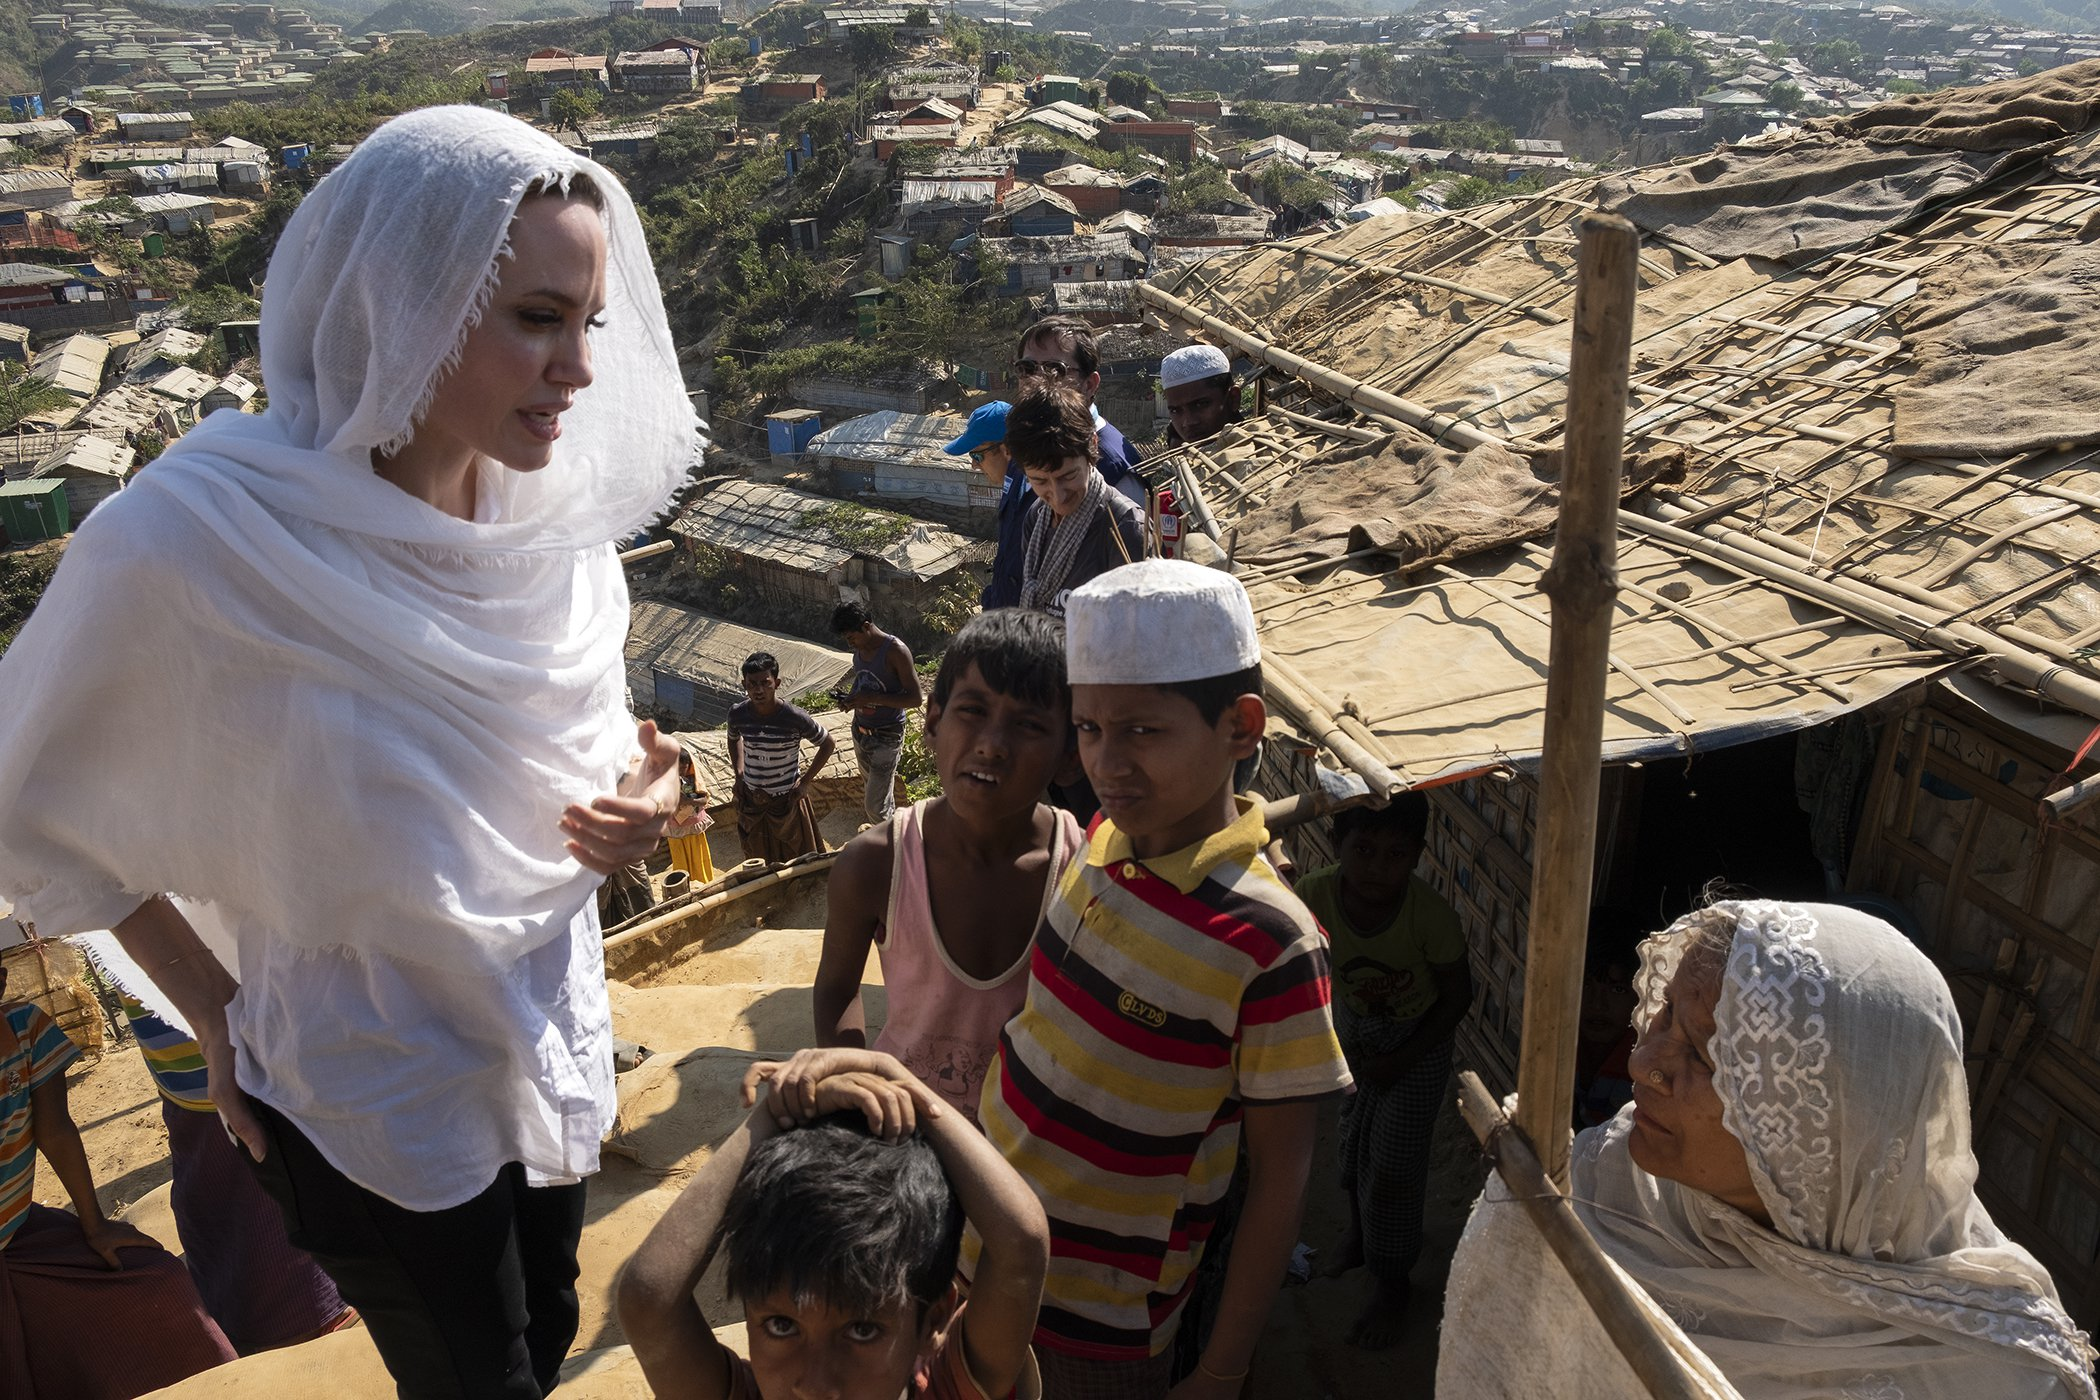 Angelina-Jolie-Rohingya-Refugees-Feburary-2.jpg